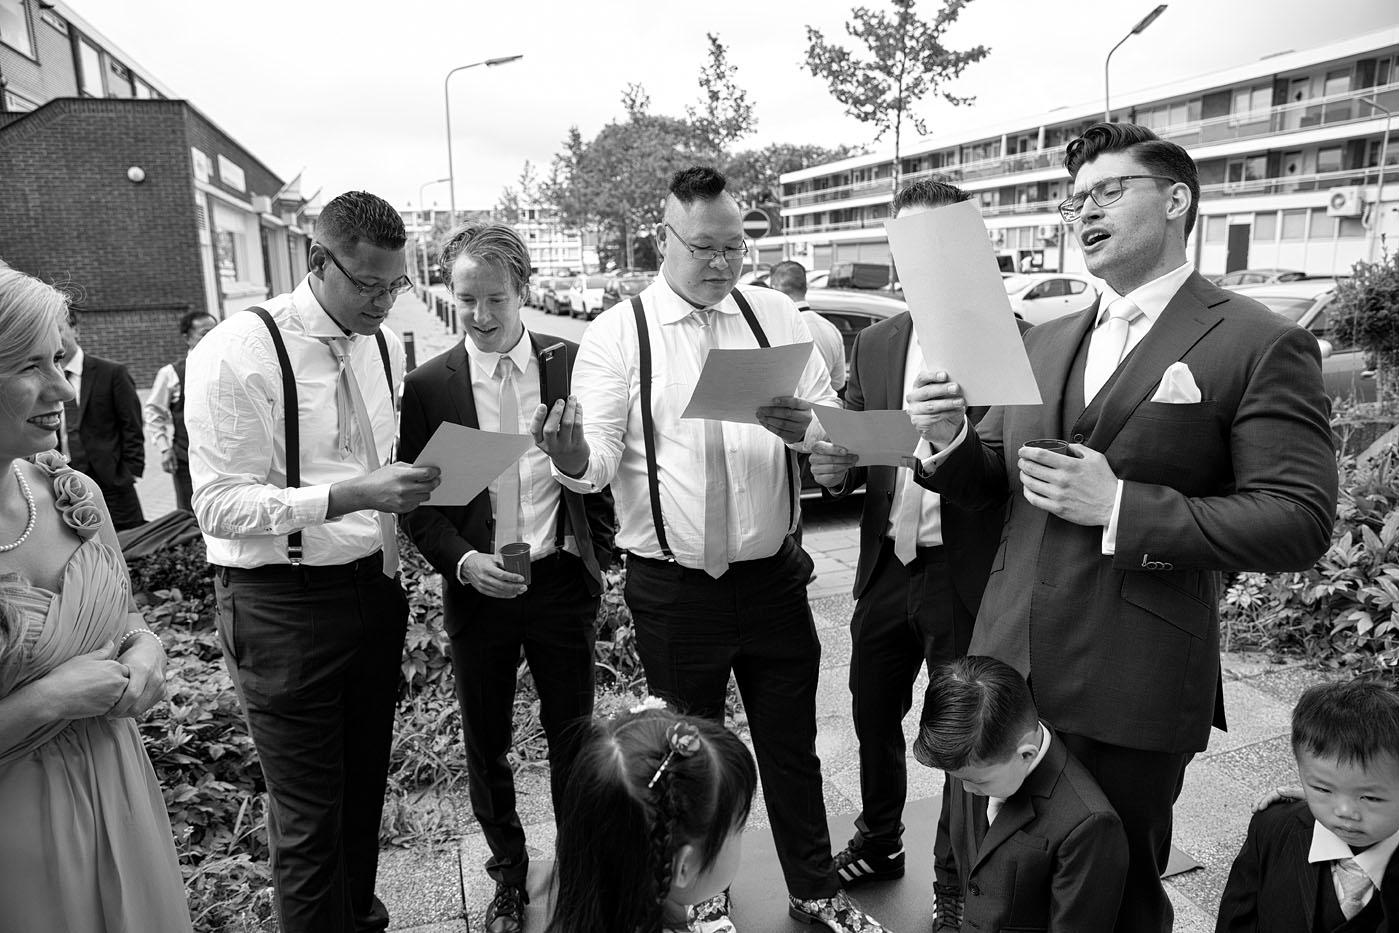 bruiloft-wedding-trouwen-fotograaf-chinees-bobhersbach-rotterdam-zingen